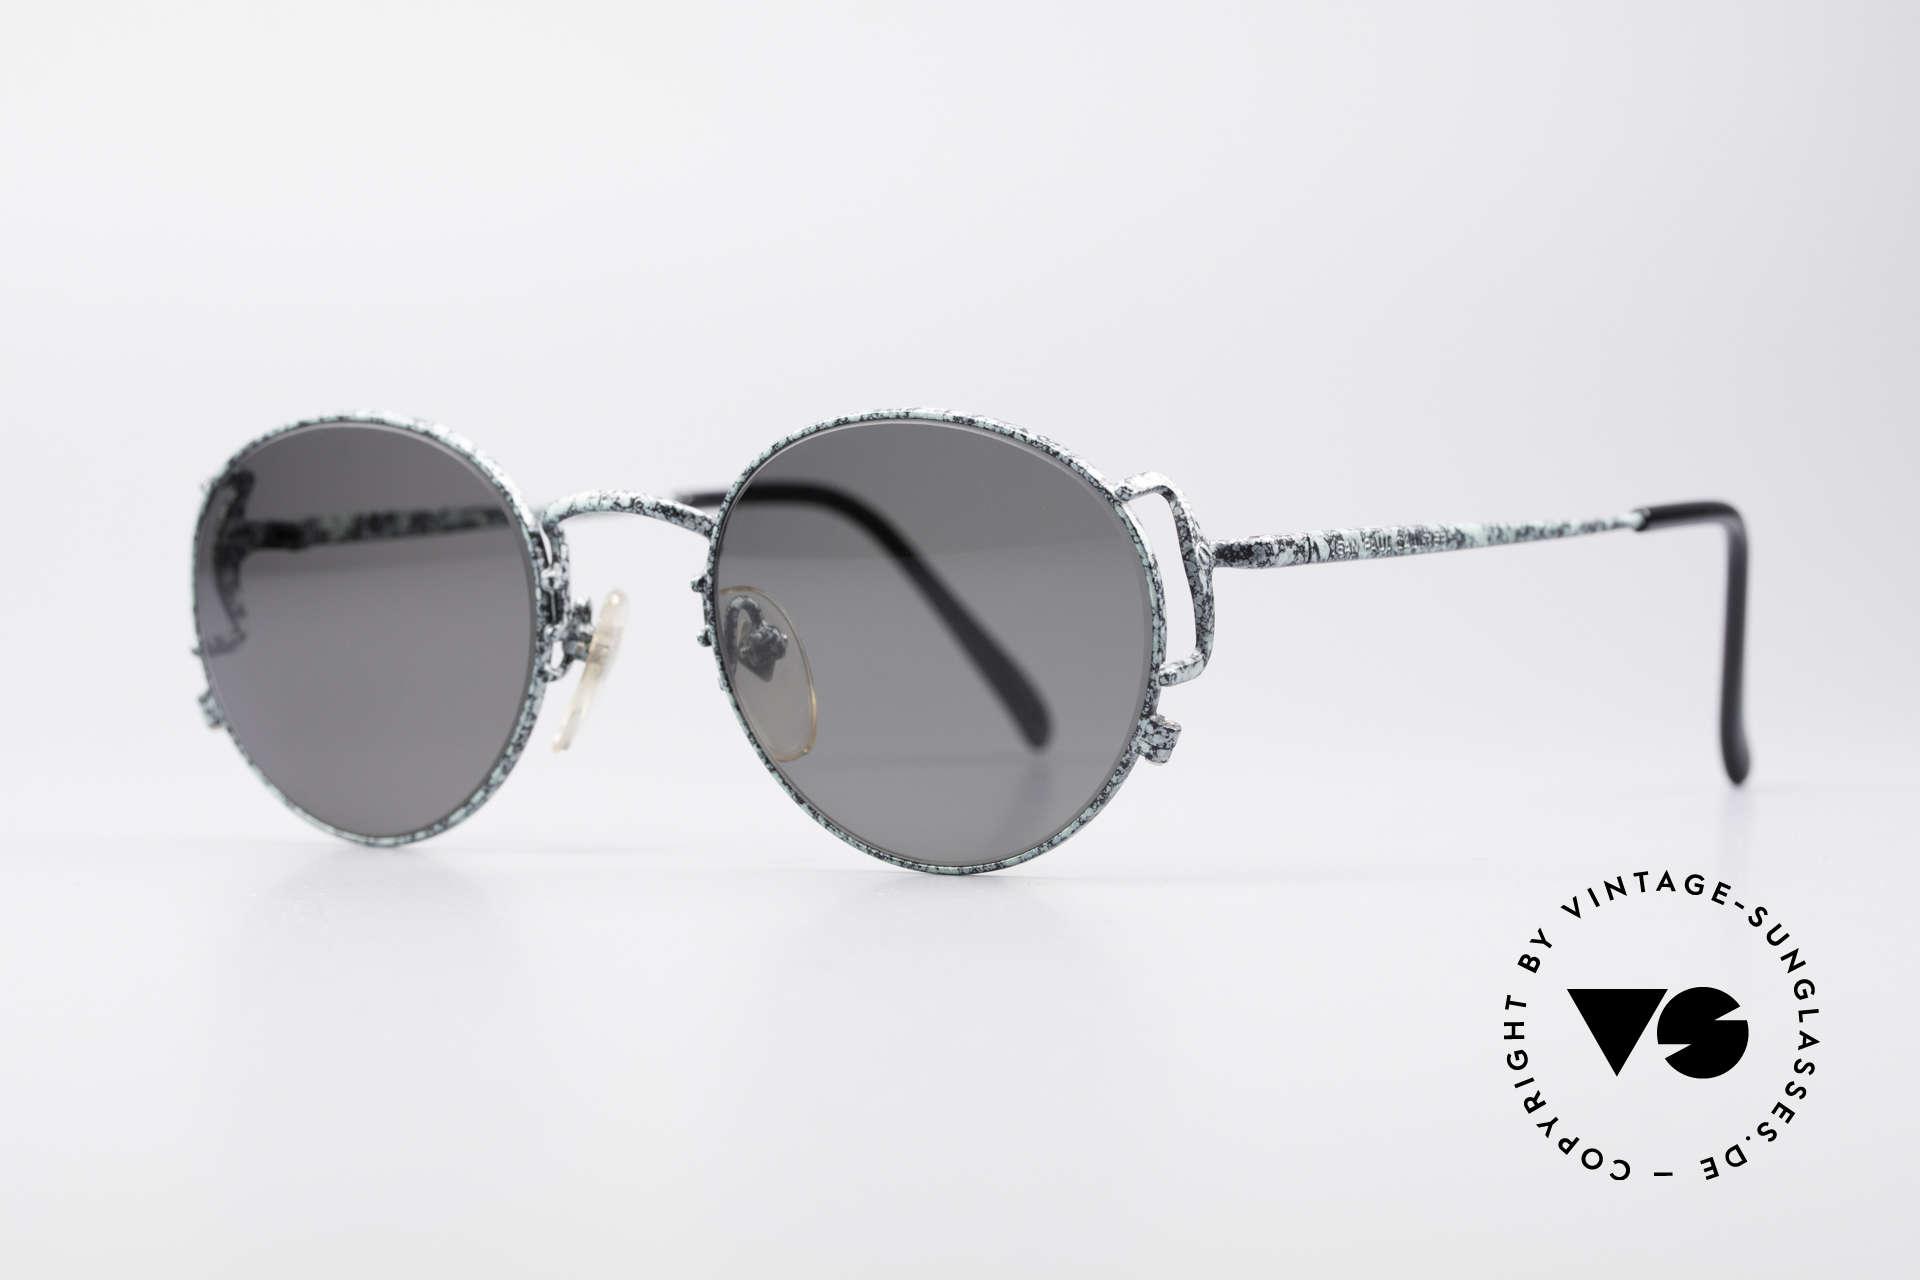 Jean Paul Gaultier 55-3178 Polarized JPG Sunglasses, POLARIZED sun lenses for 100% UV protection, Made for Men and Women